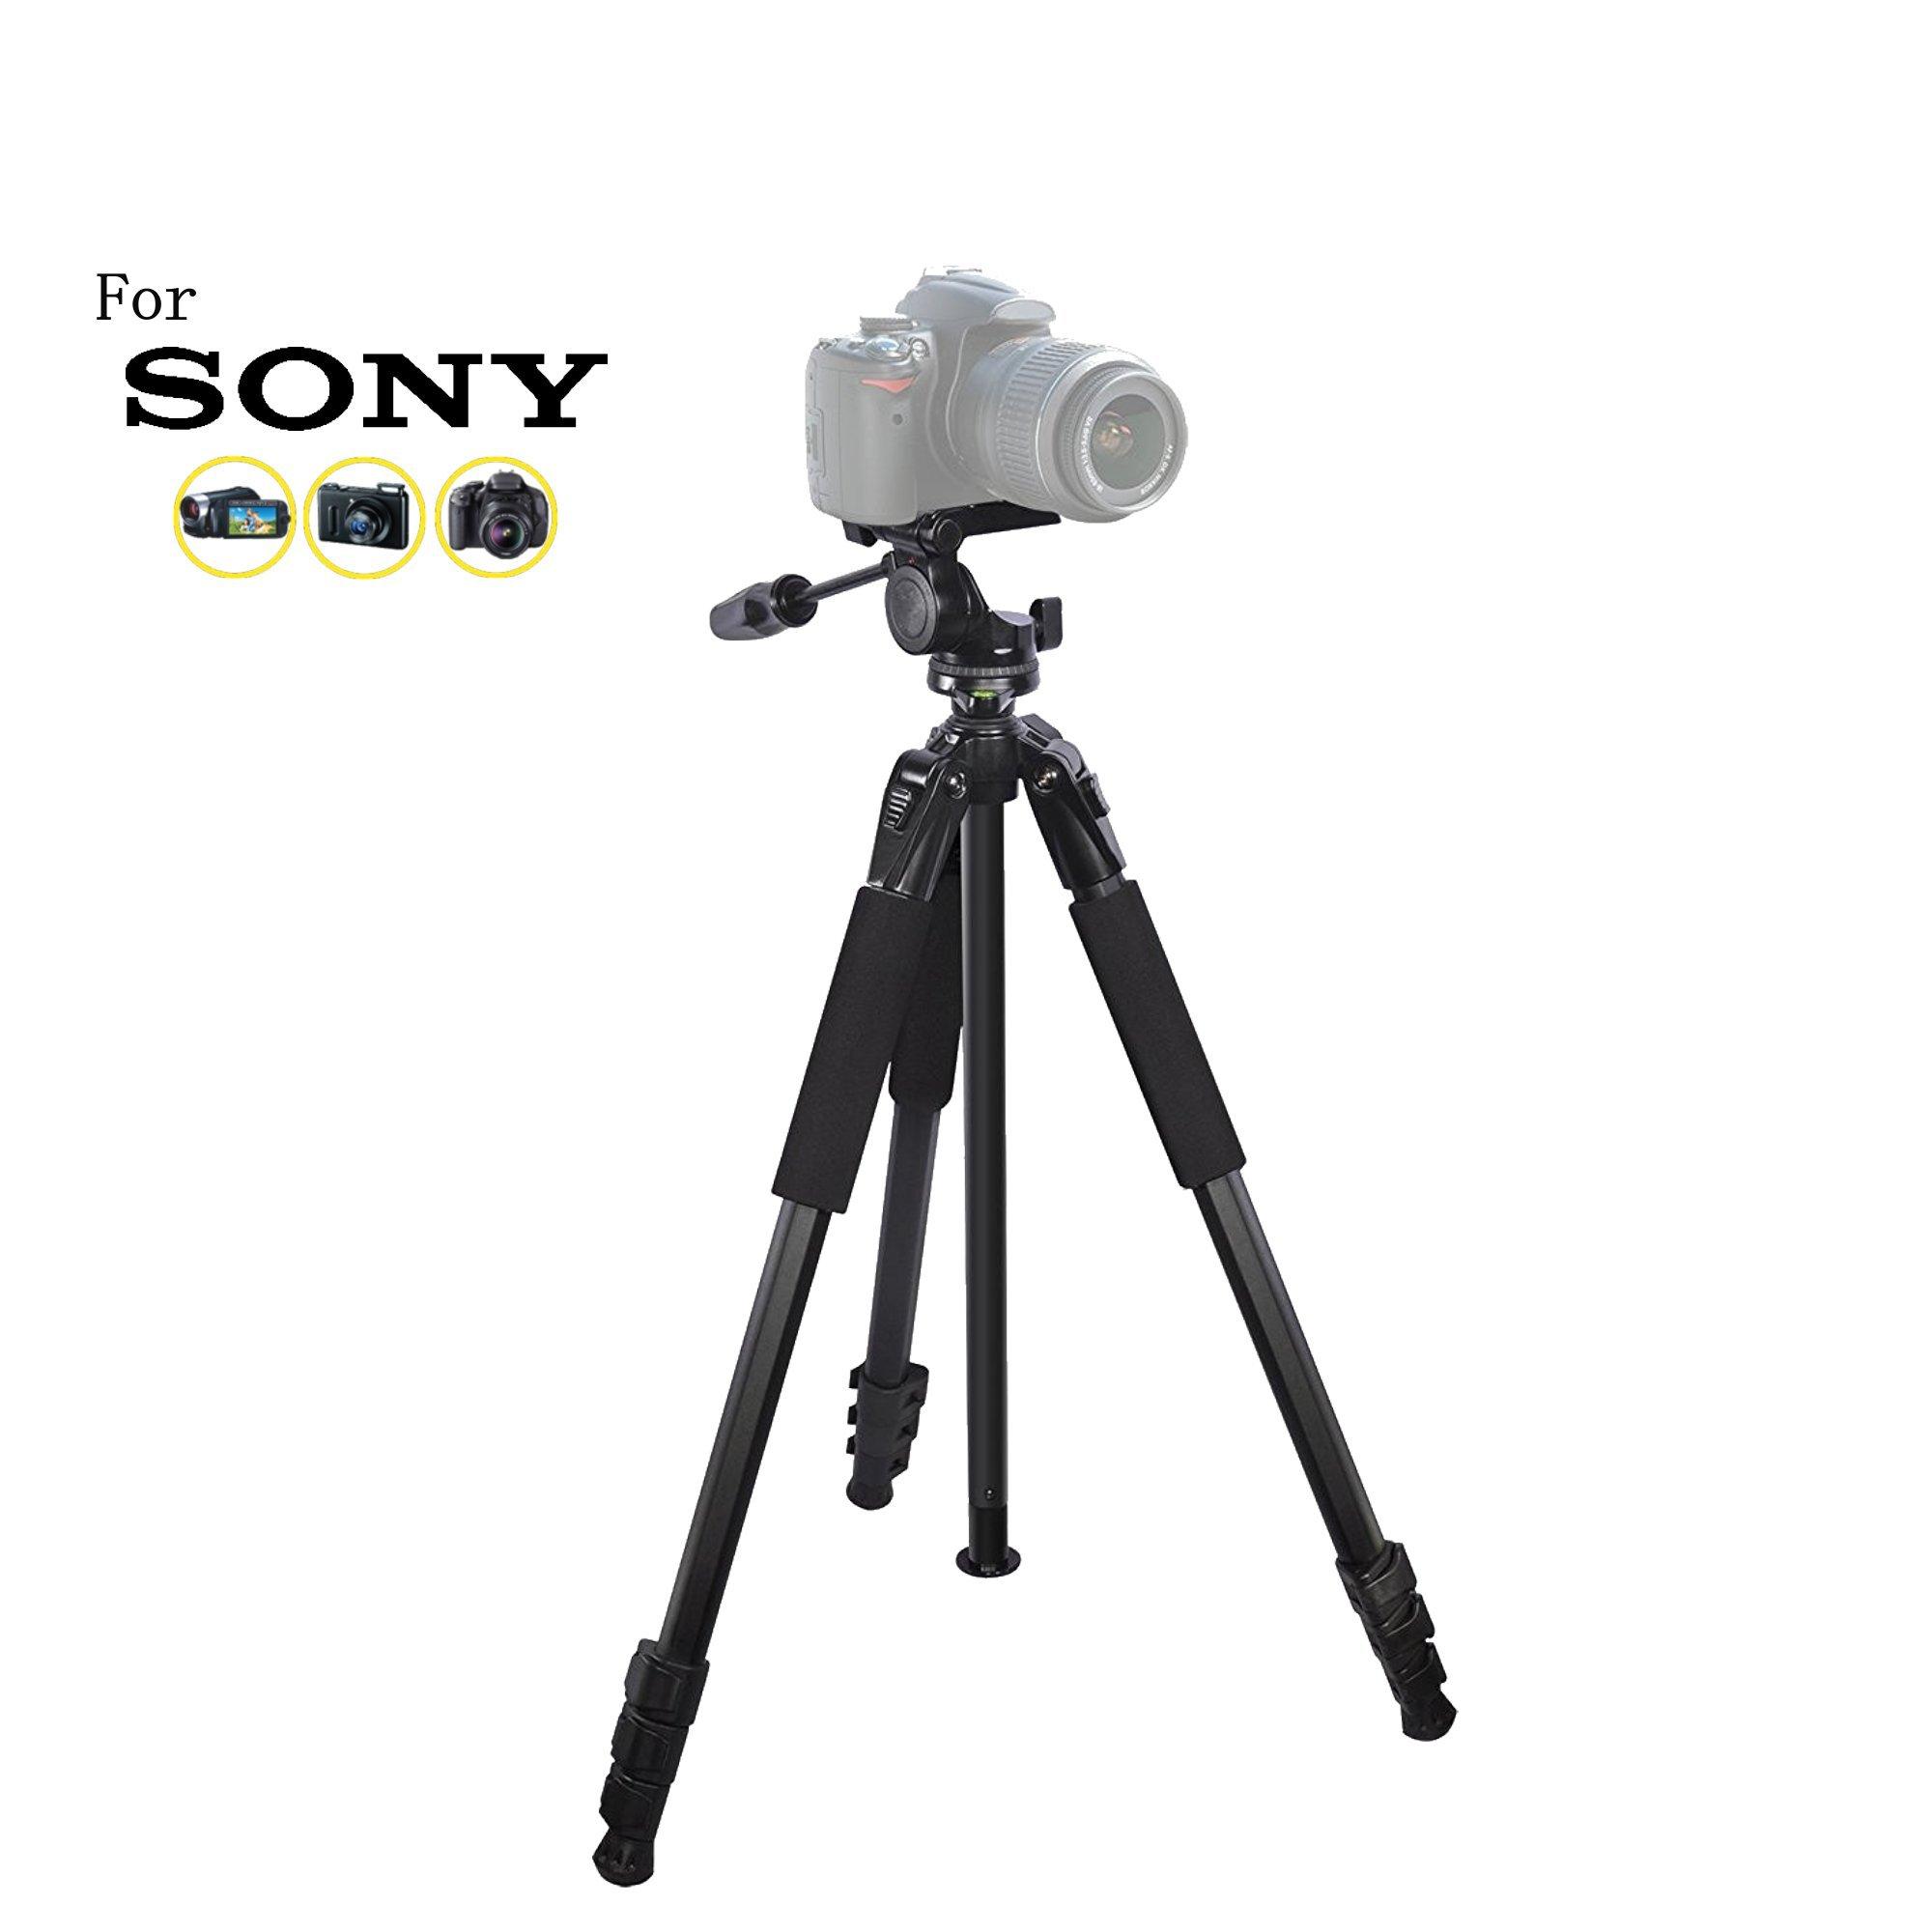 80 inch Heavy Duty Portable tripod for Sony Alpha SLT-A33, SLT-A35, SLT-A37, SLT-A55, SLT-A57, SLT-A65, SLT-A77, SLT-A77 II, SLT-A99, SLT-A58, SLT-A68 Cameras:Travel tripod by iSnapPhoto